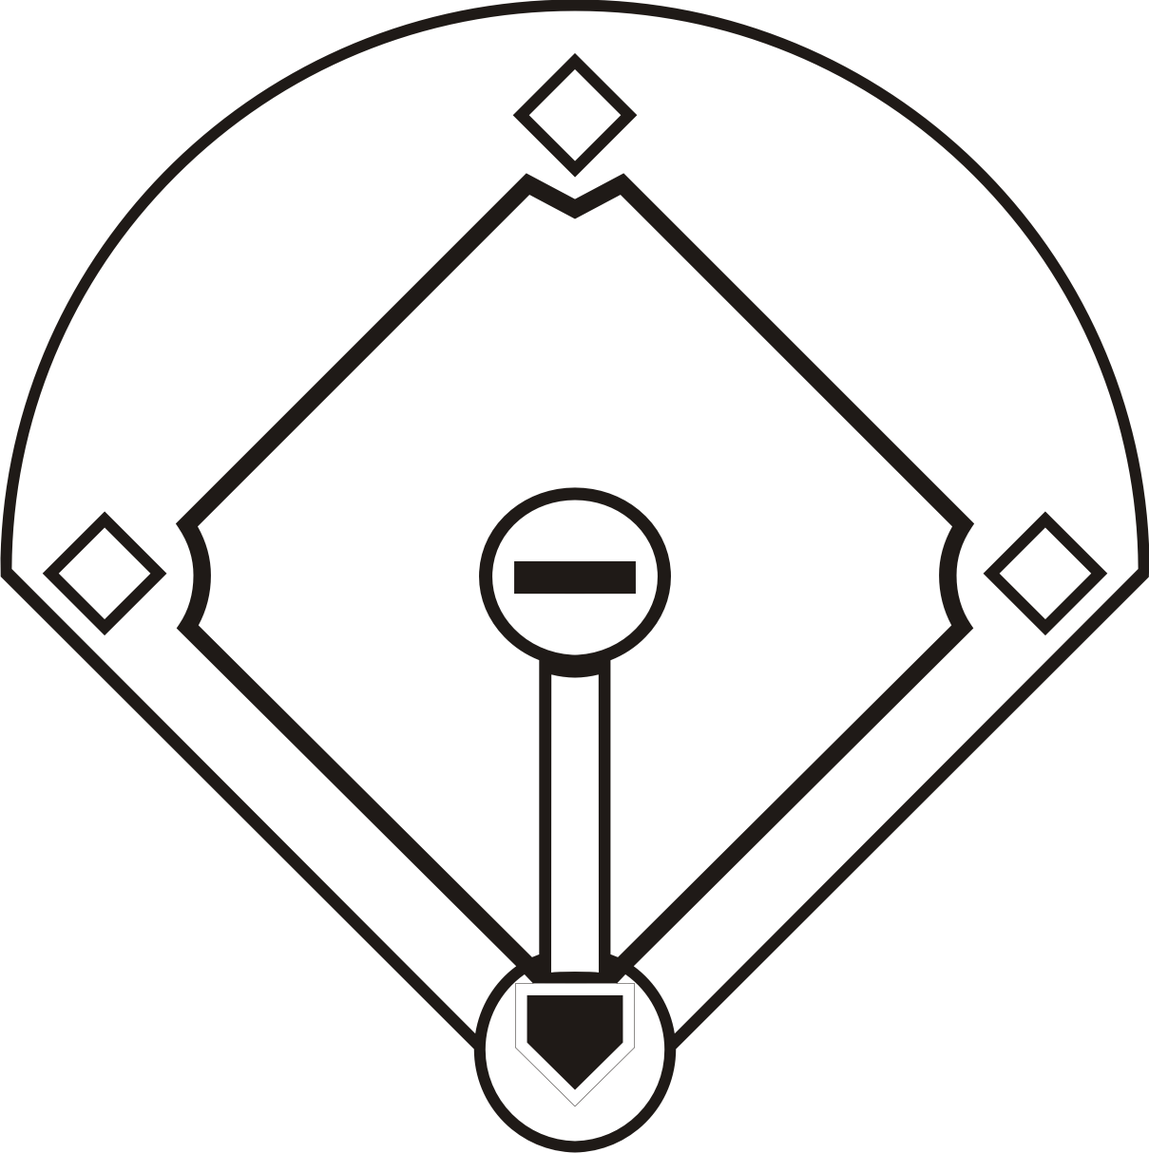 Baseball diamond clipart images 3